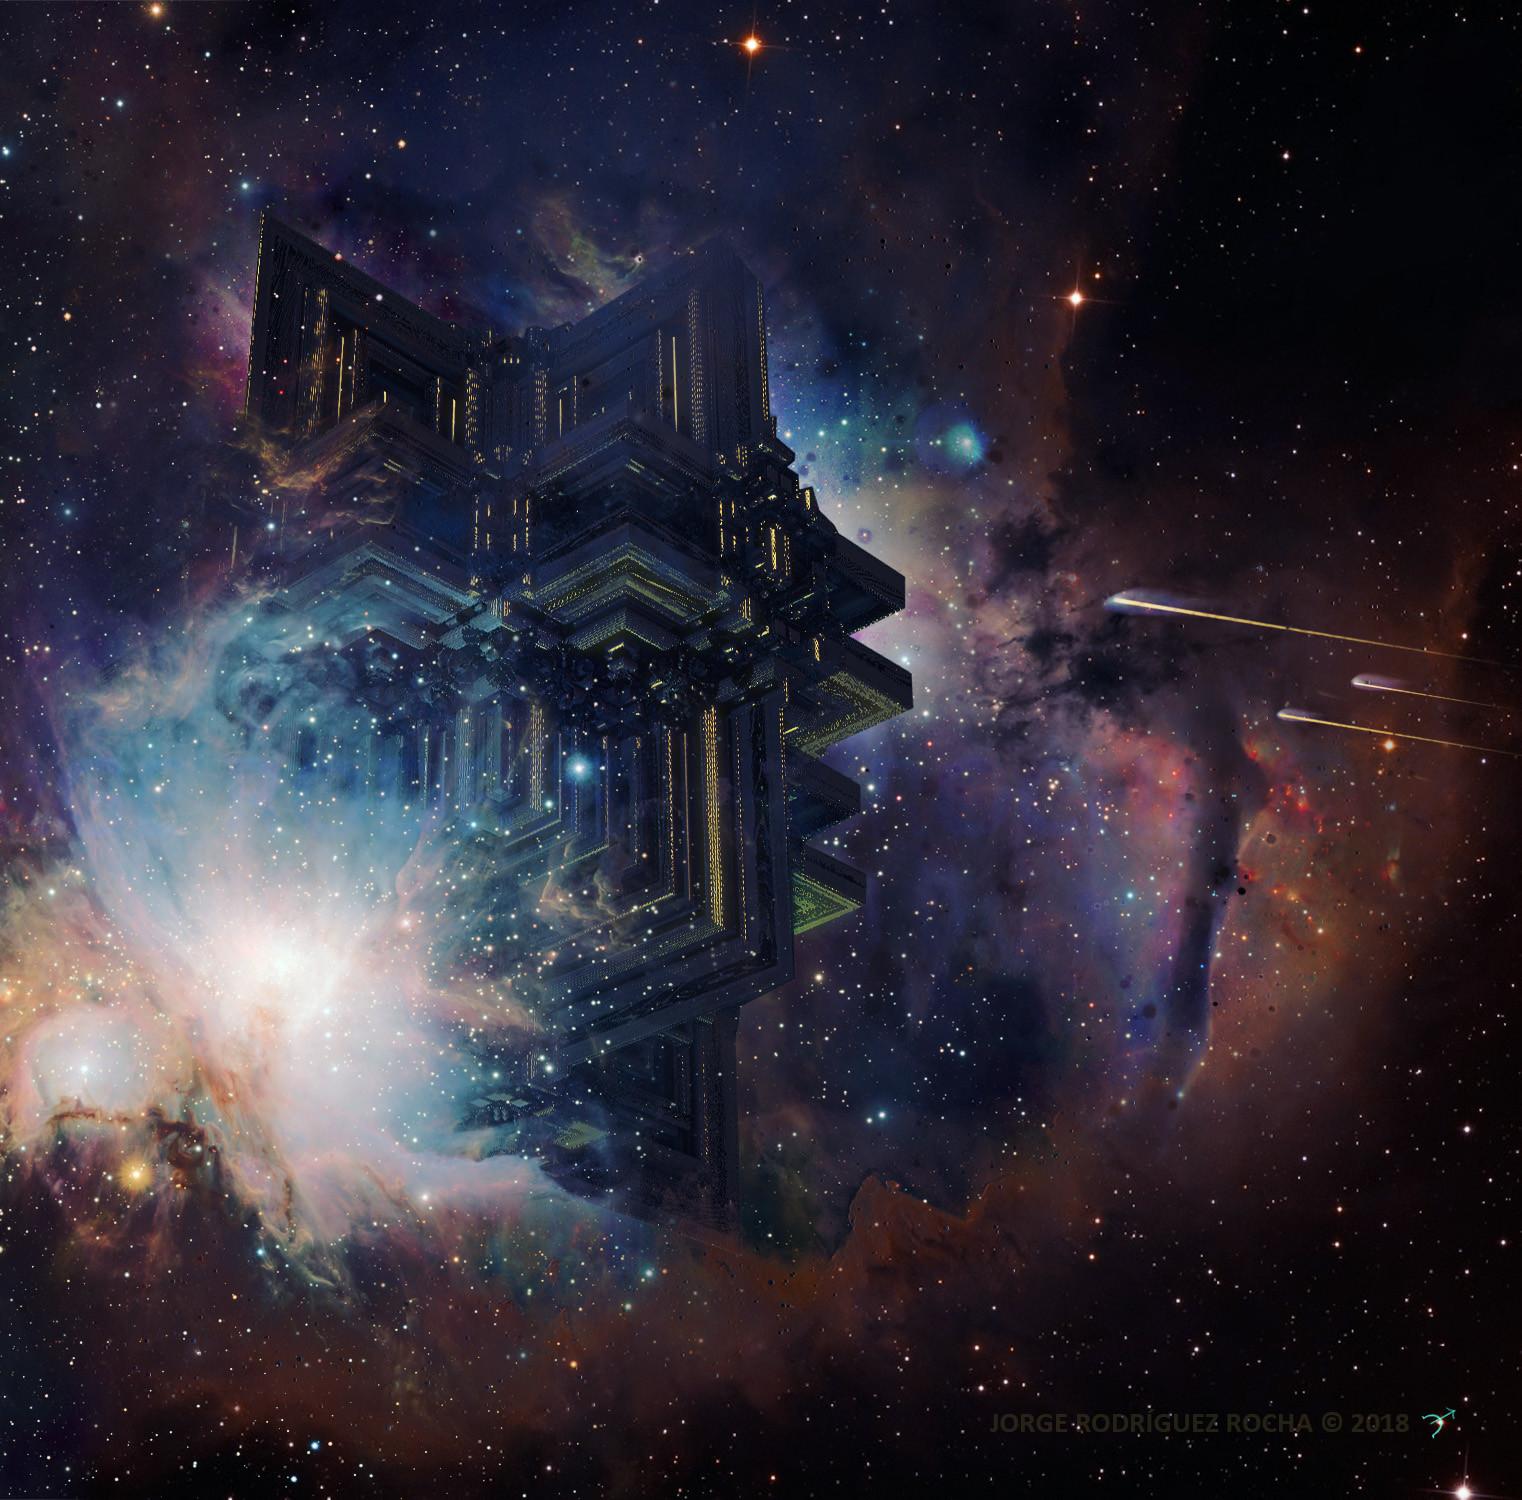 Arriving - Concept Art